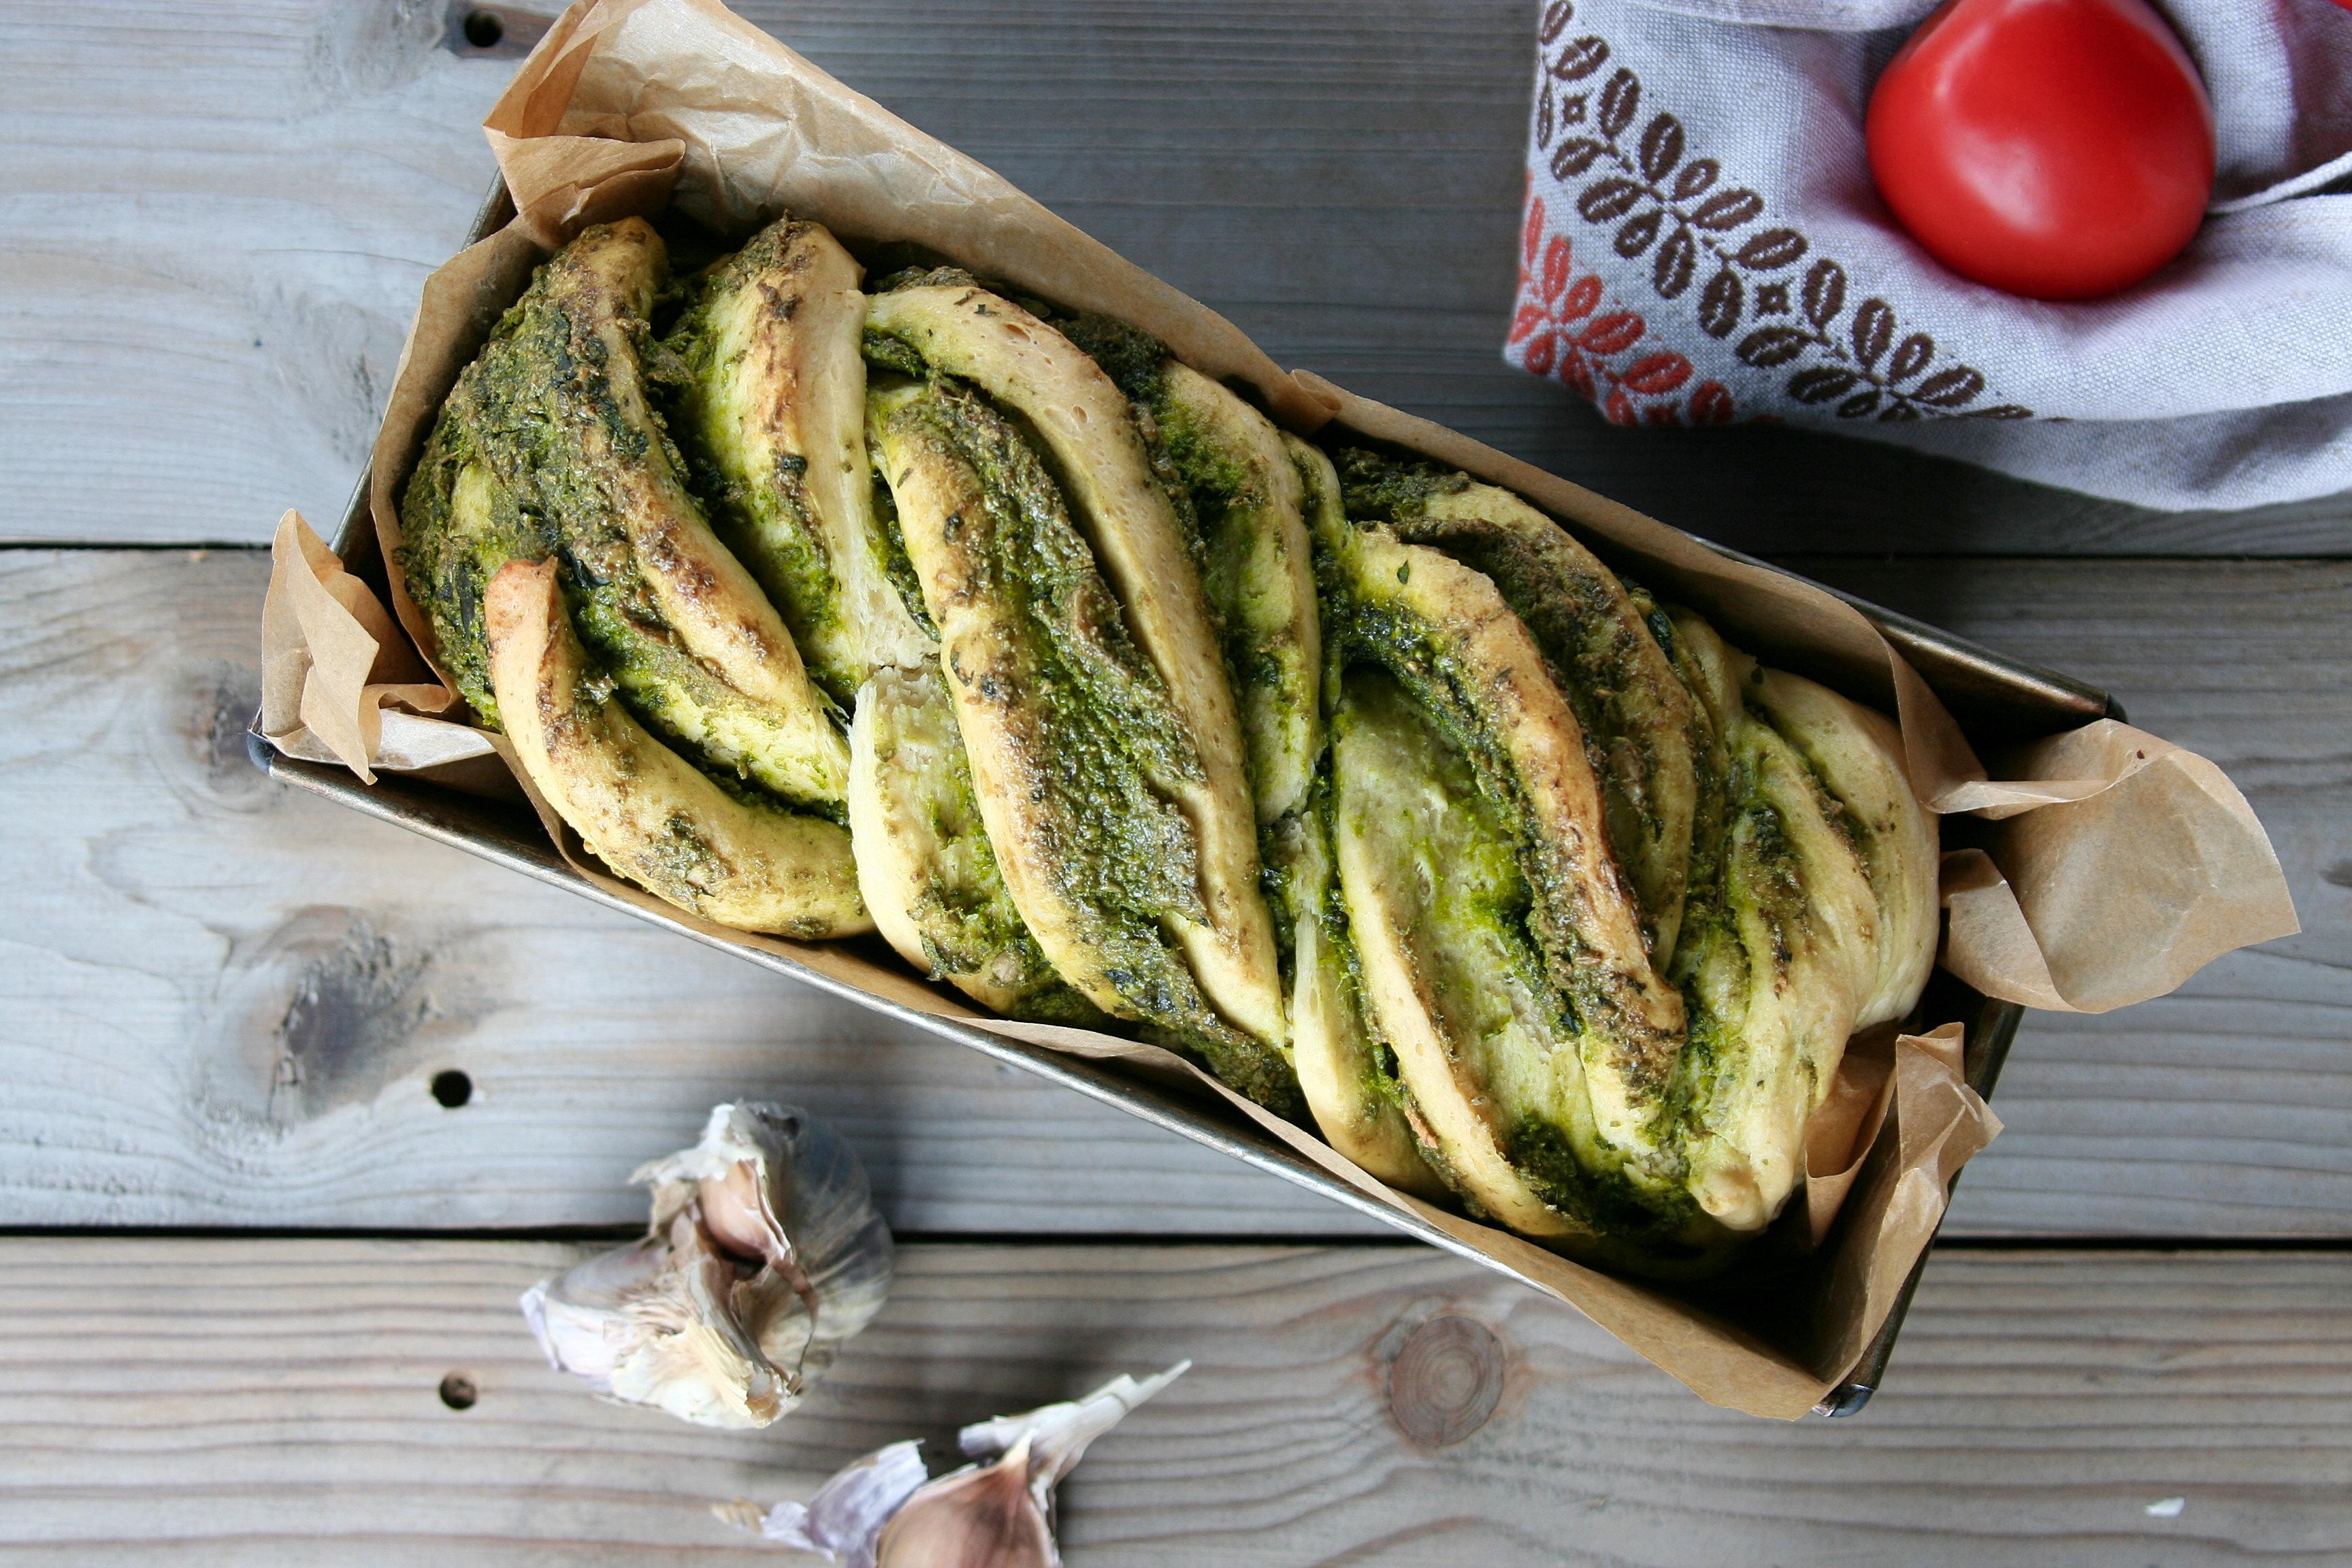 Chléb s bylinkovo-špenátovým pestem